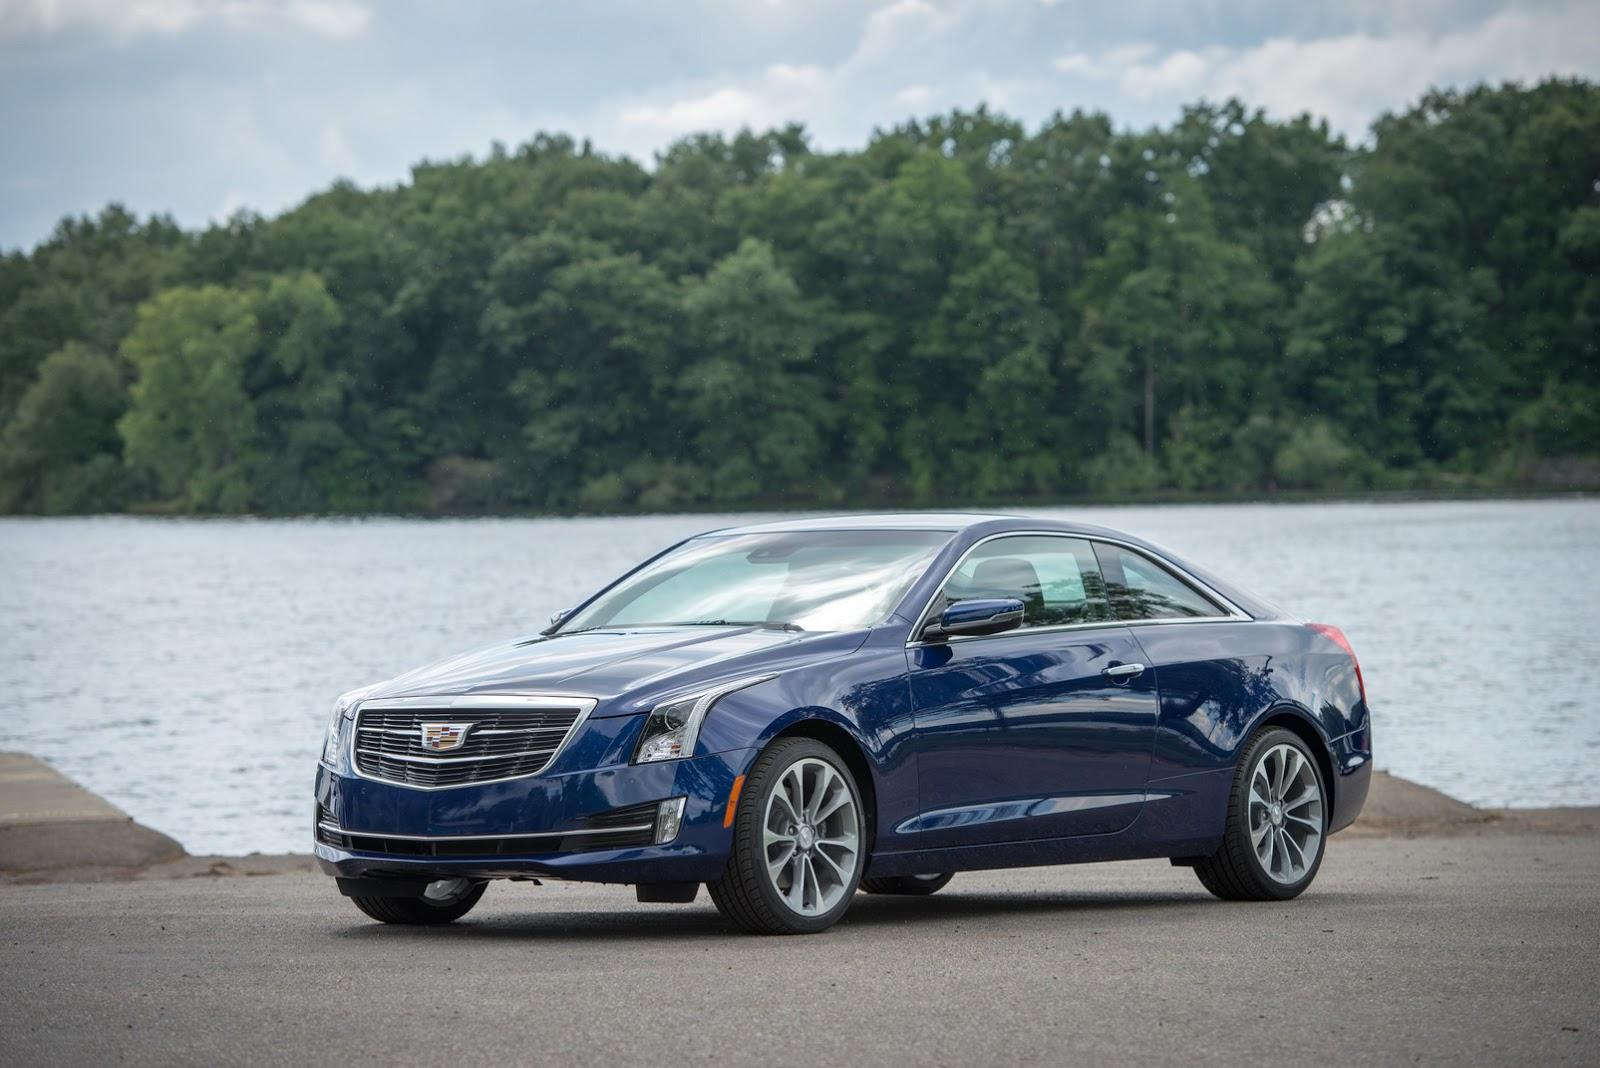 2015-Cadillac-ATScoupe-5.jpg